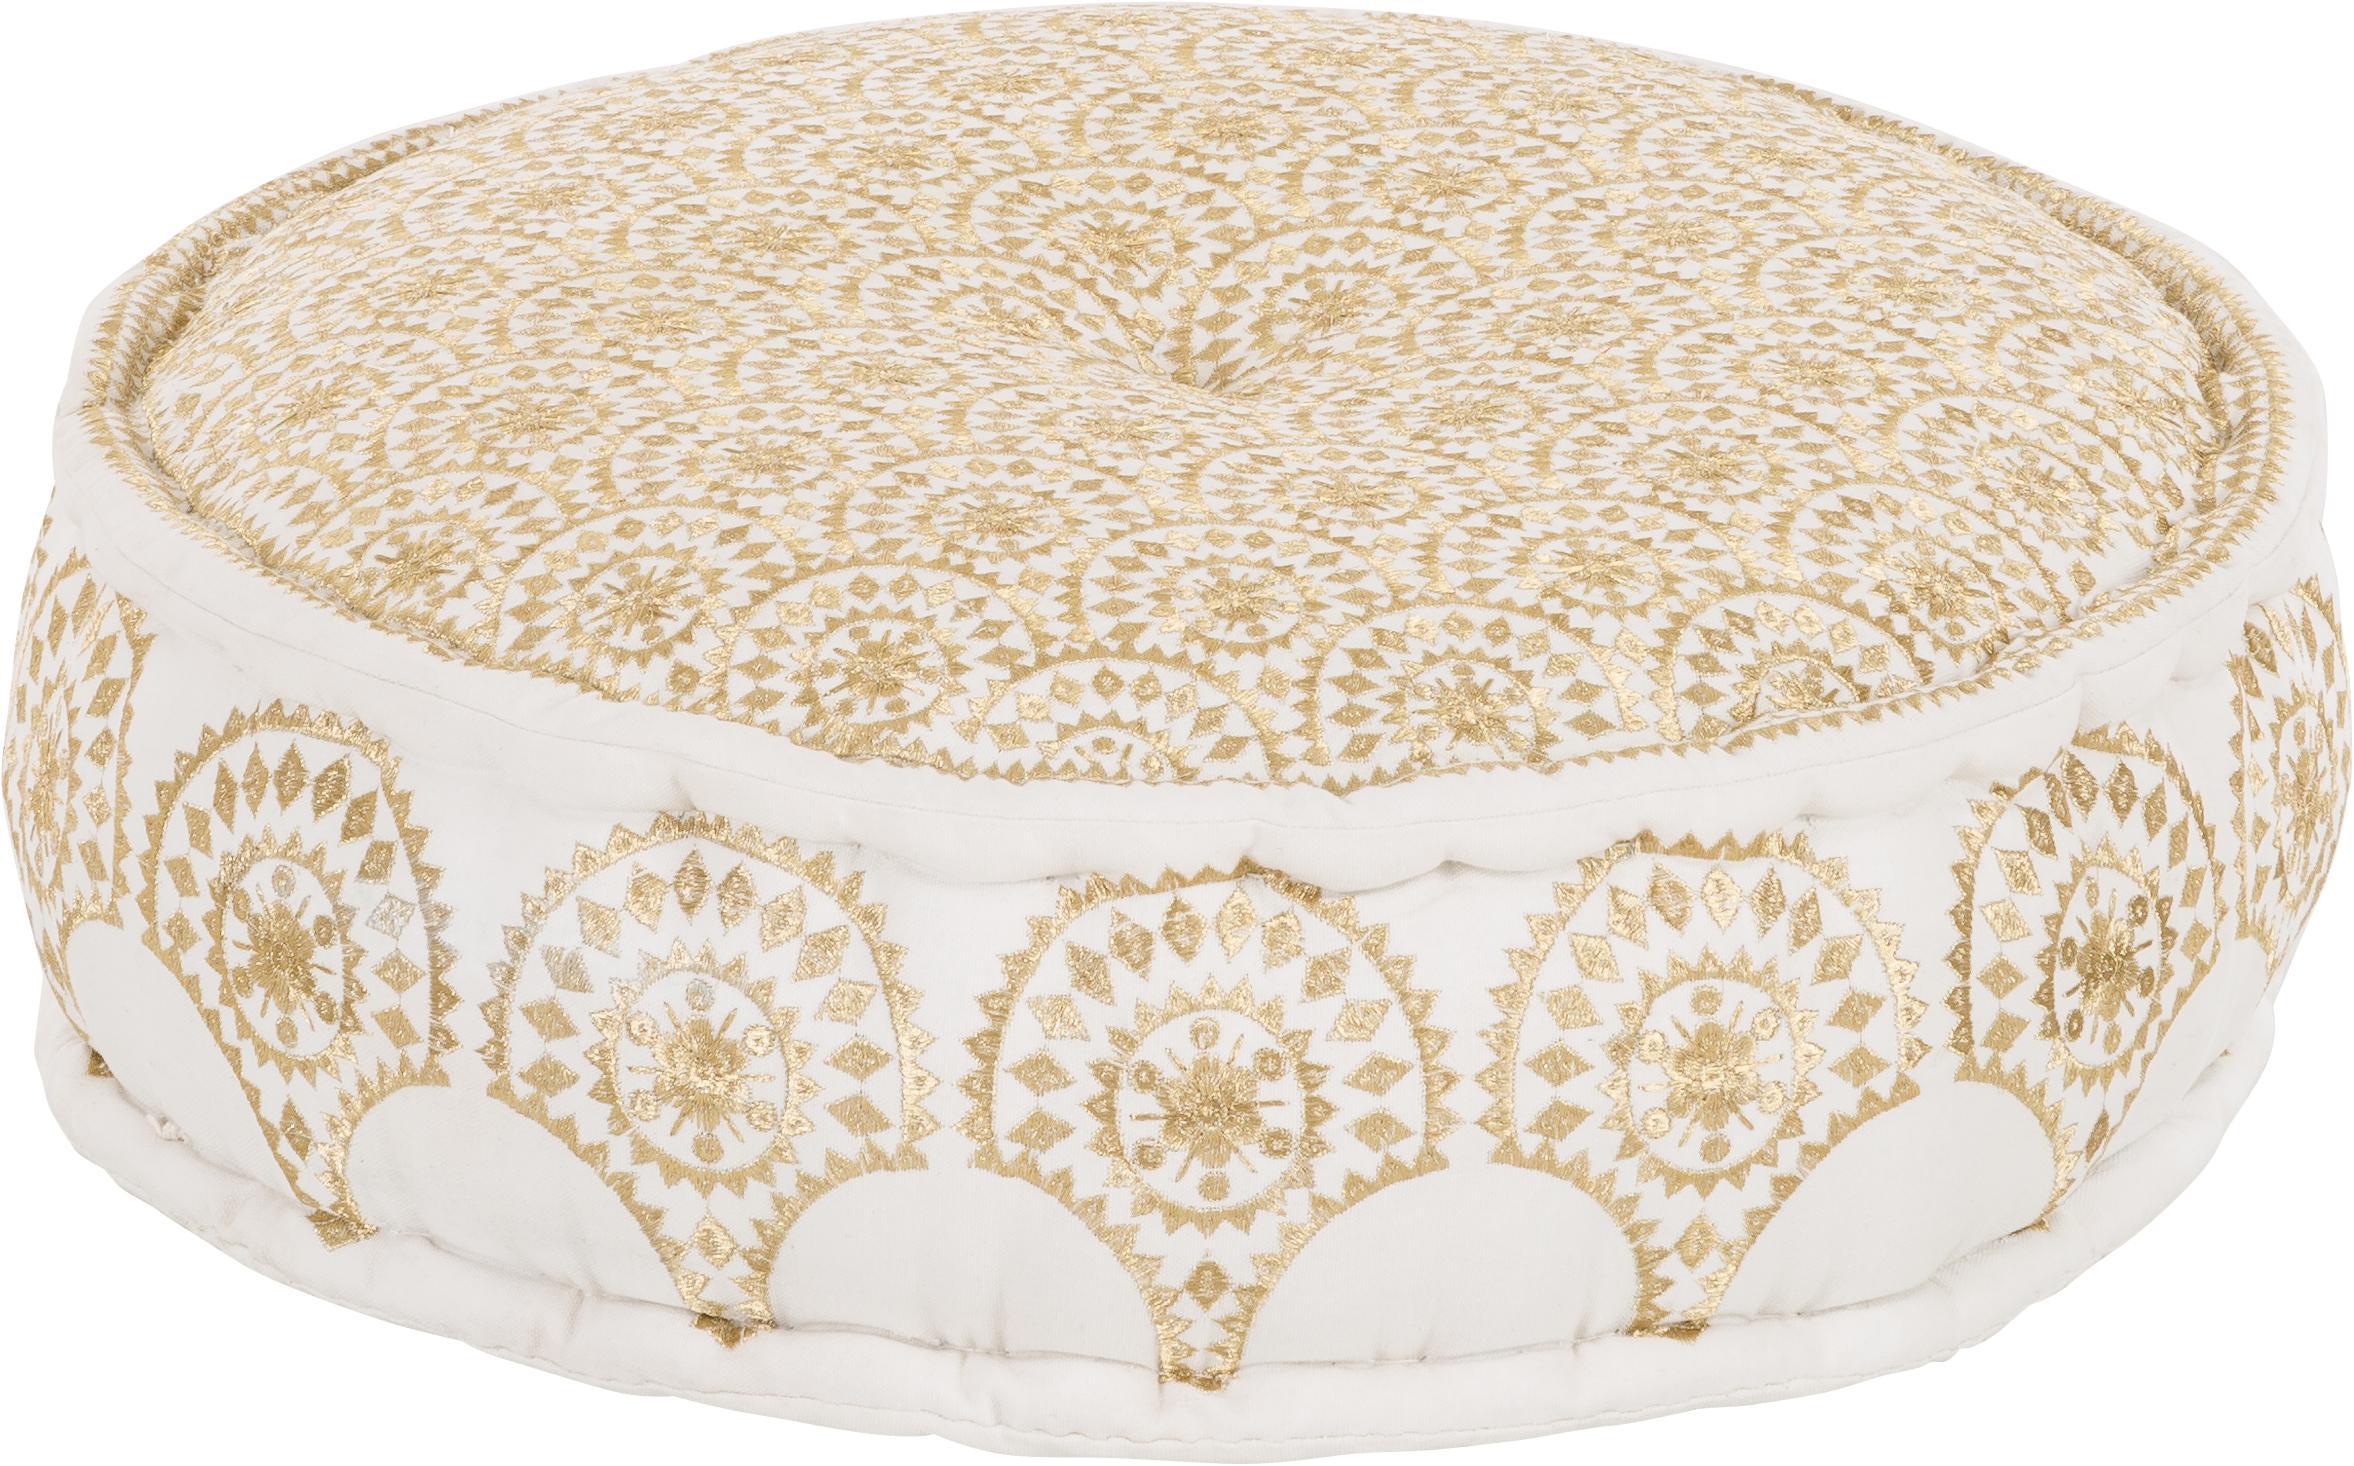 Cuscino da pavimento rotondo ricamato Casablanca, Rivestimento: tela di cotone solido, Bianco, dorato, Ø 60 x Alt. 25 cm